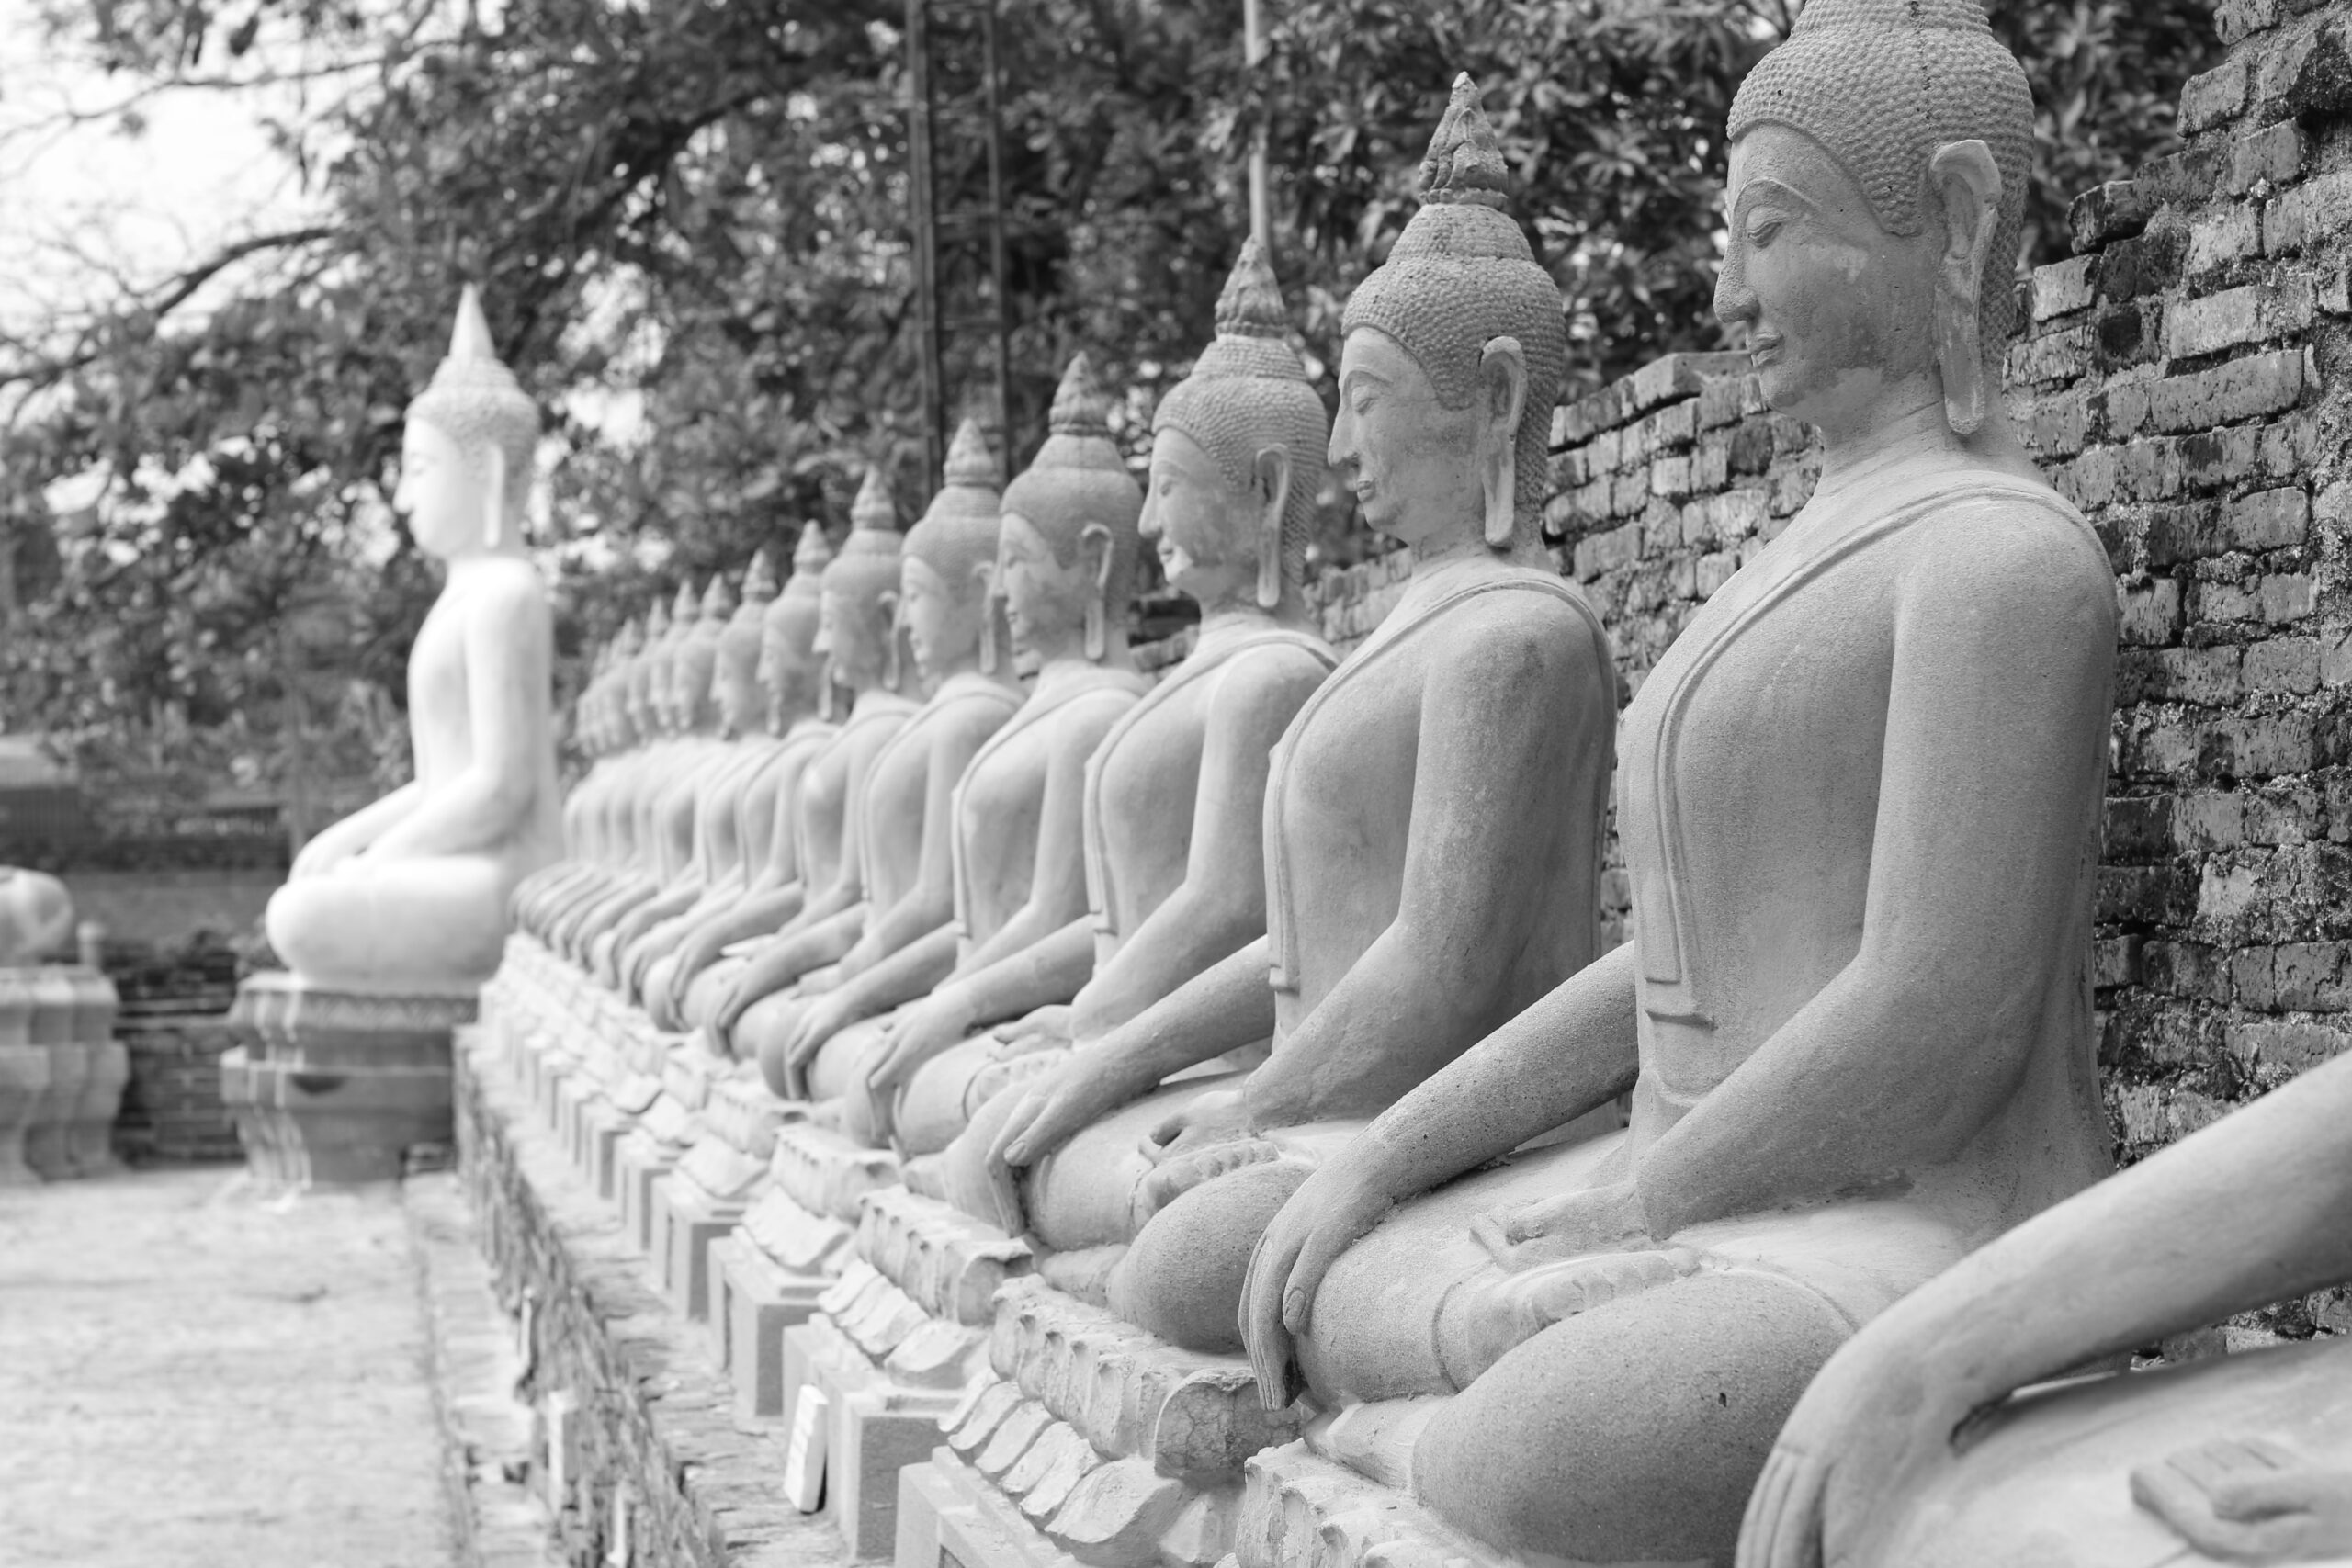 chris-man-Buddha statues in a row-unsplash